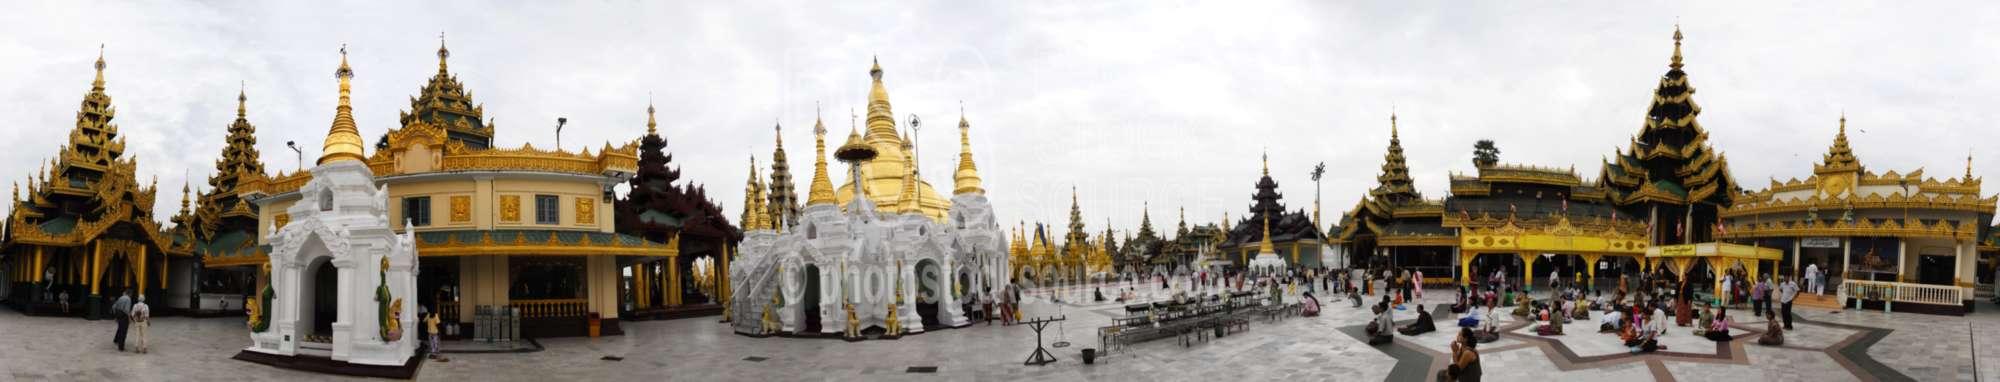 Shwedagon Pagoda Shrine